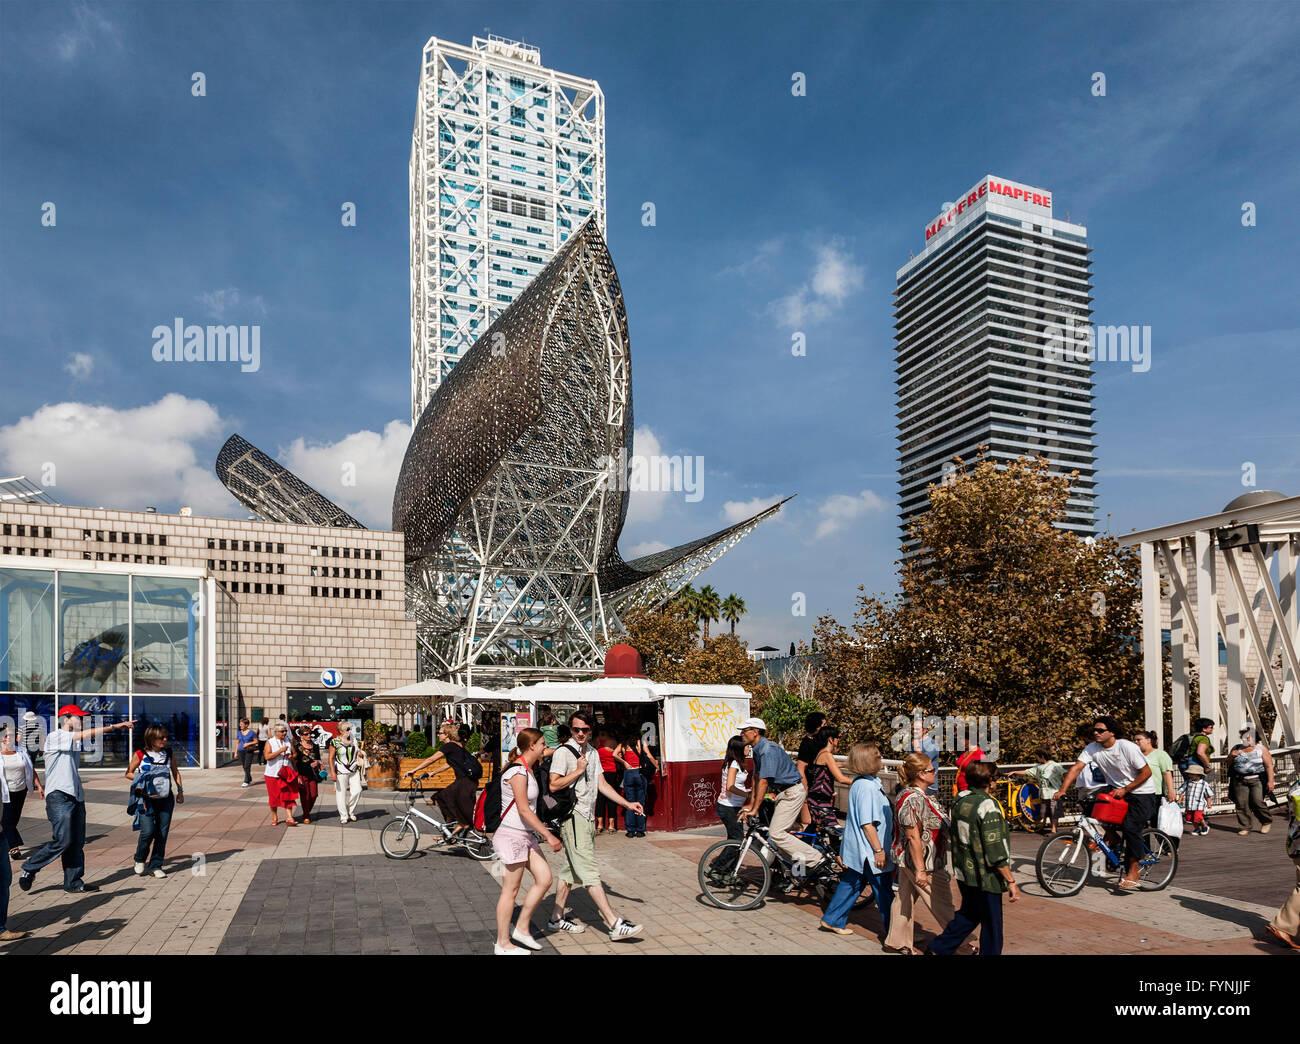 Platja de la Barceloneta Hotels Arts sculpture, Frank Gehry Passeig Maritim Promenade people Stock Photo